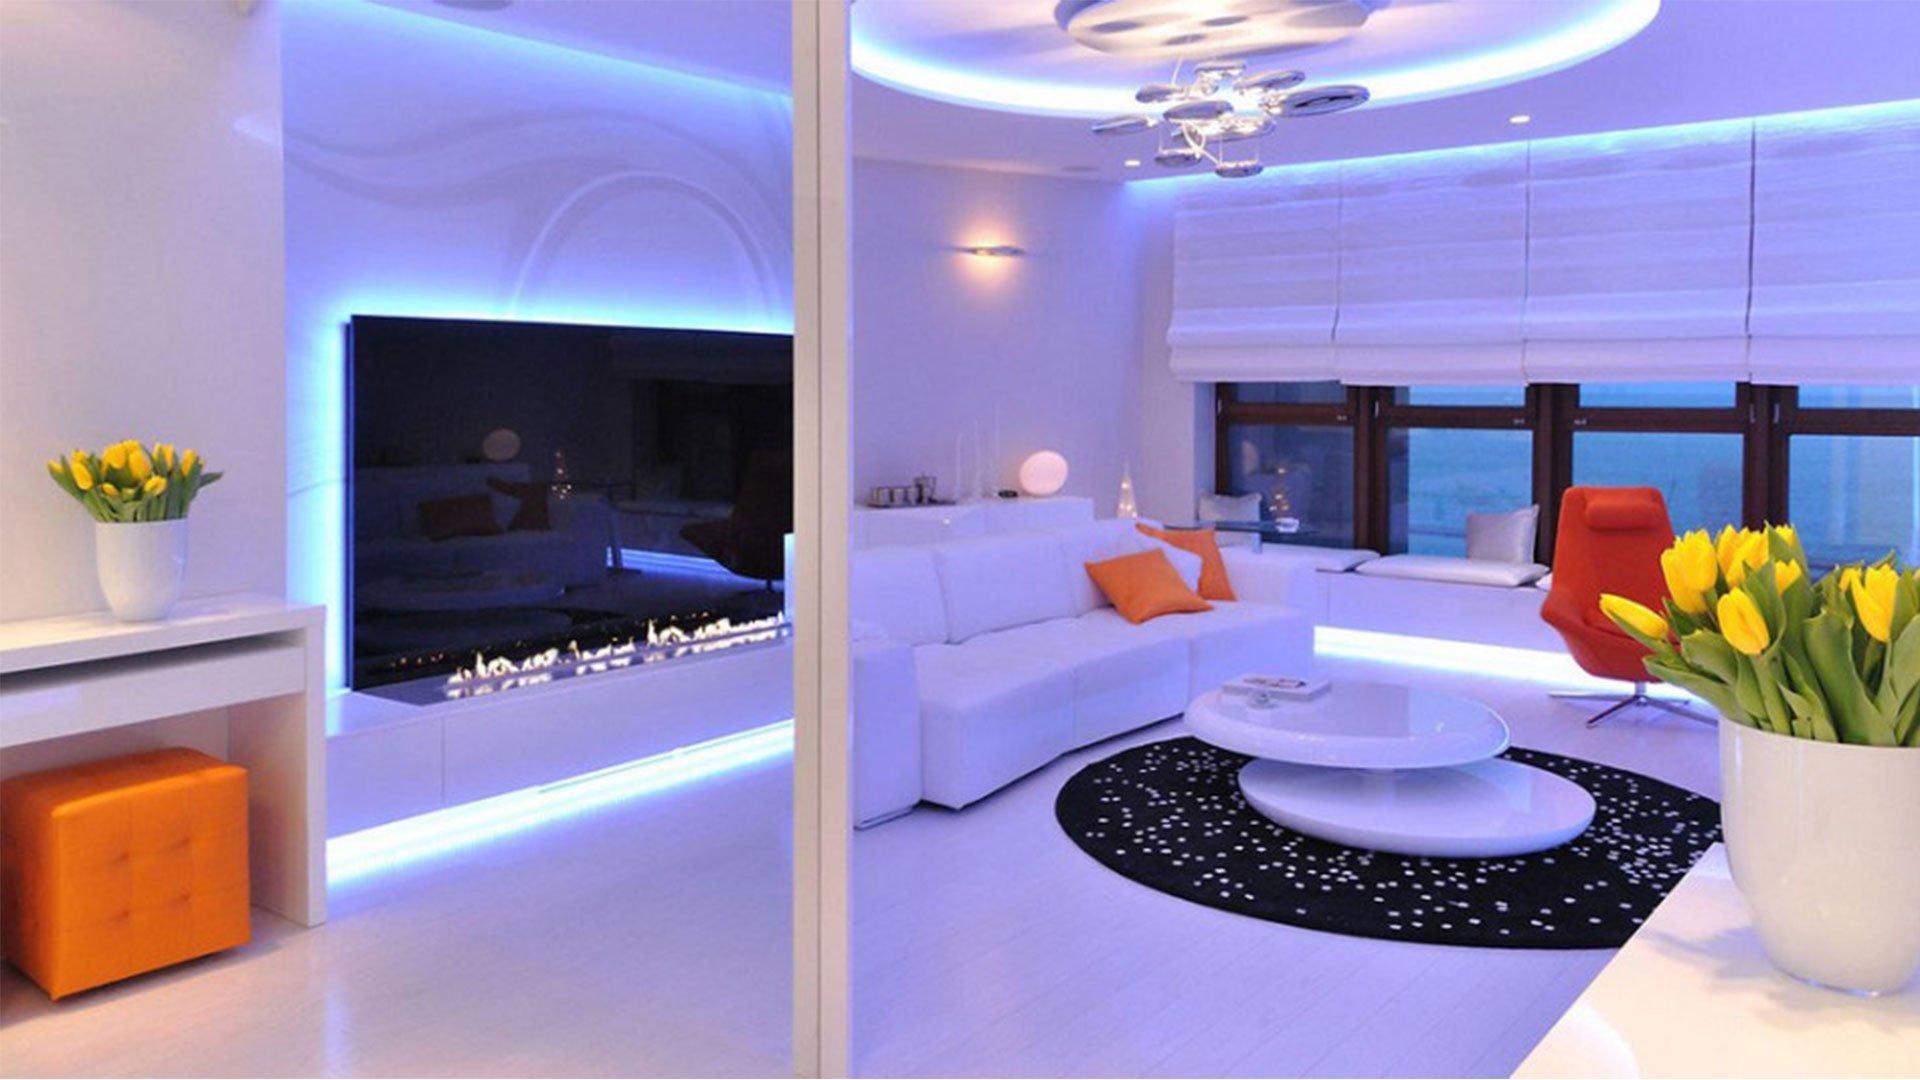 Family living room futuristic technology interior design